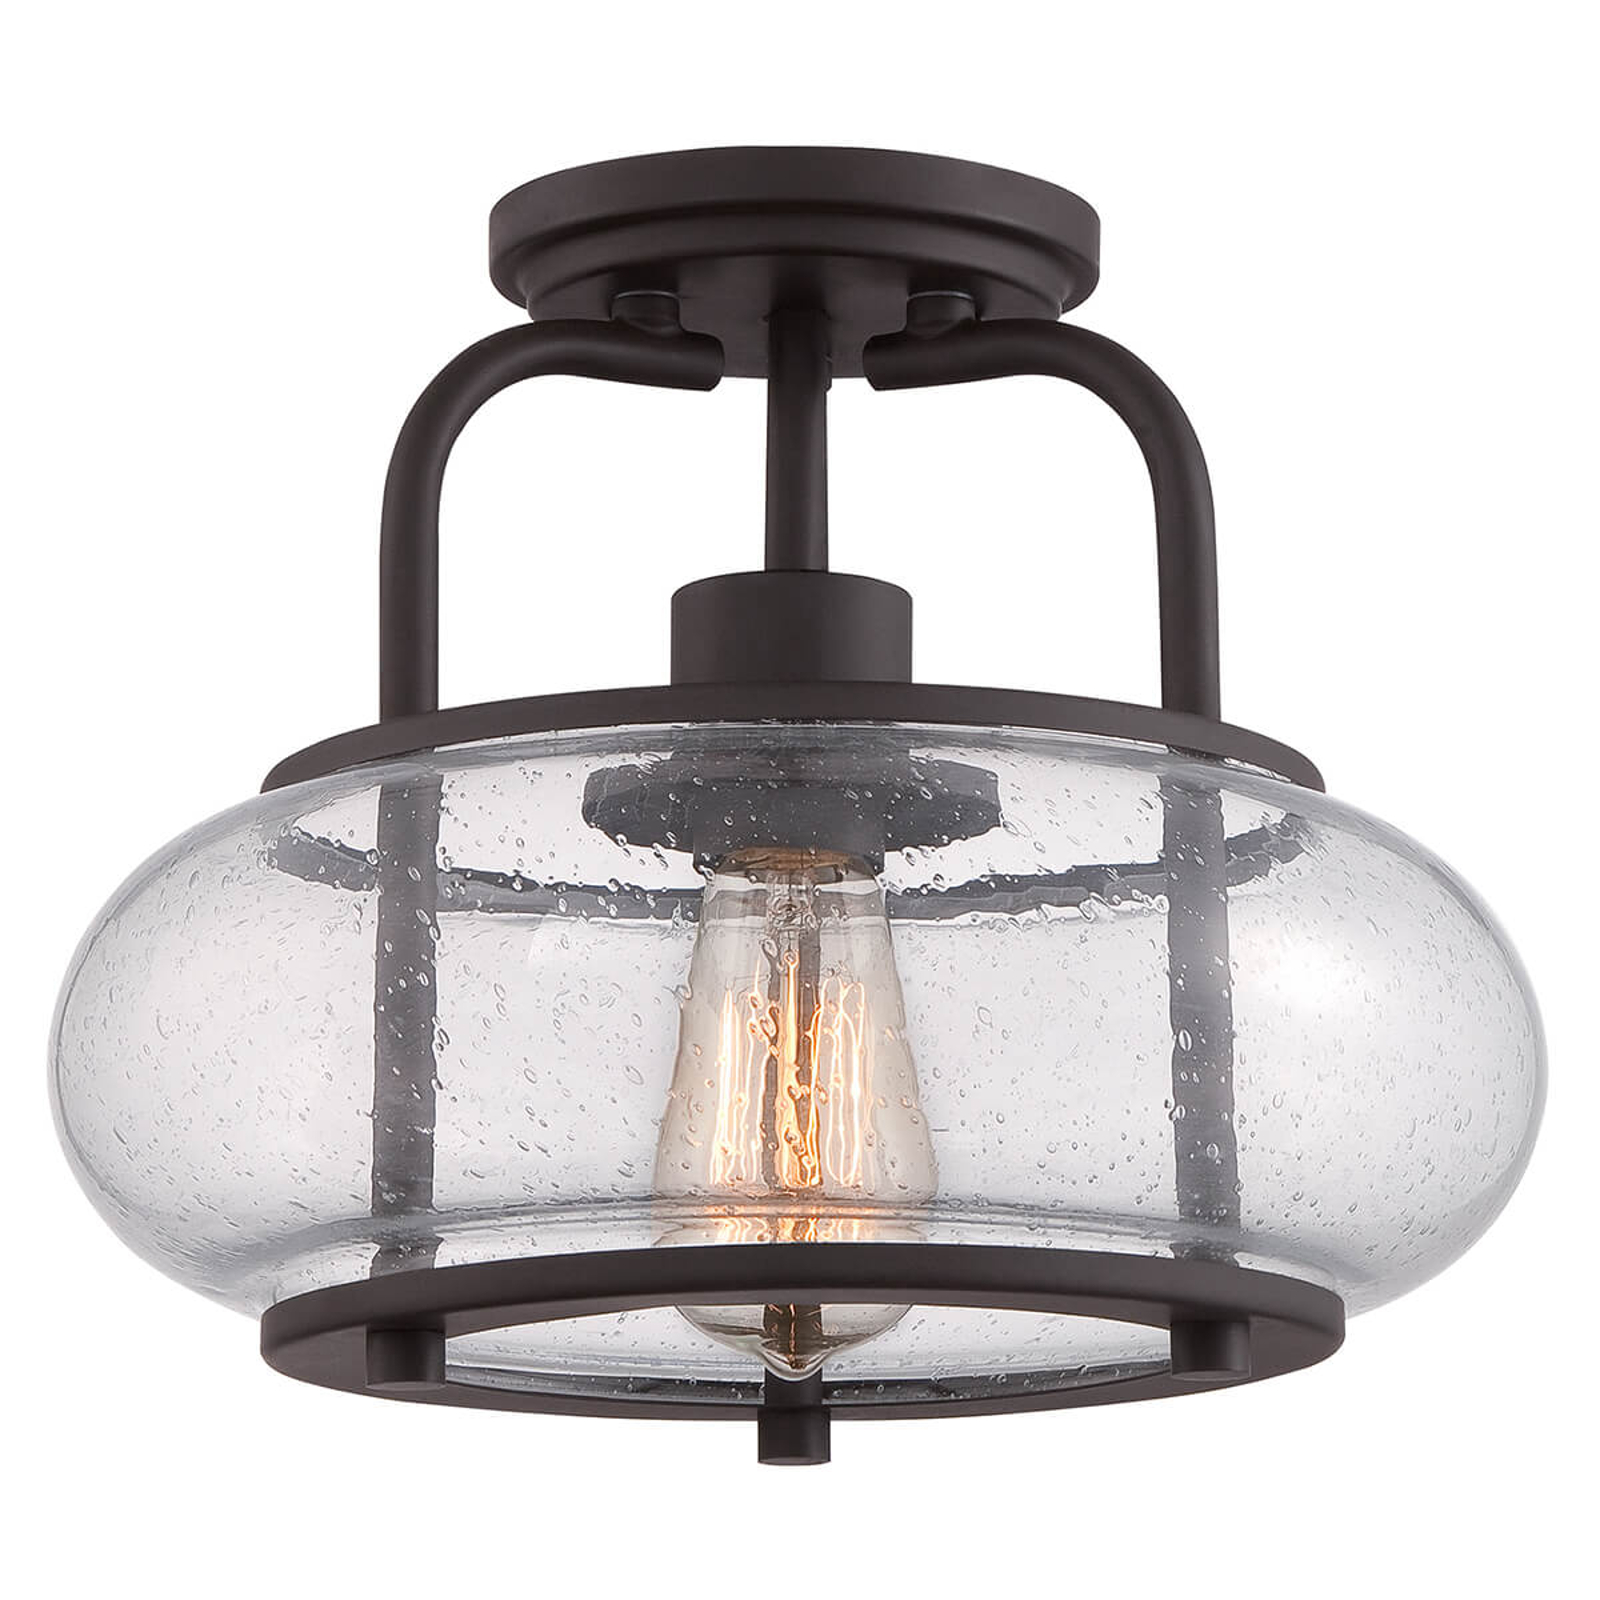 Plafondlamp Trilogy met afstand